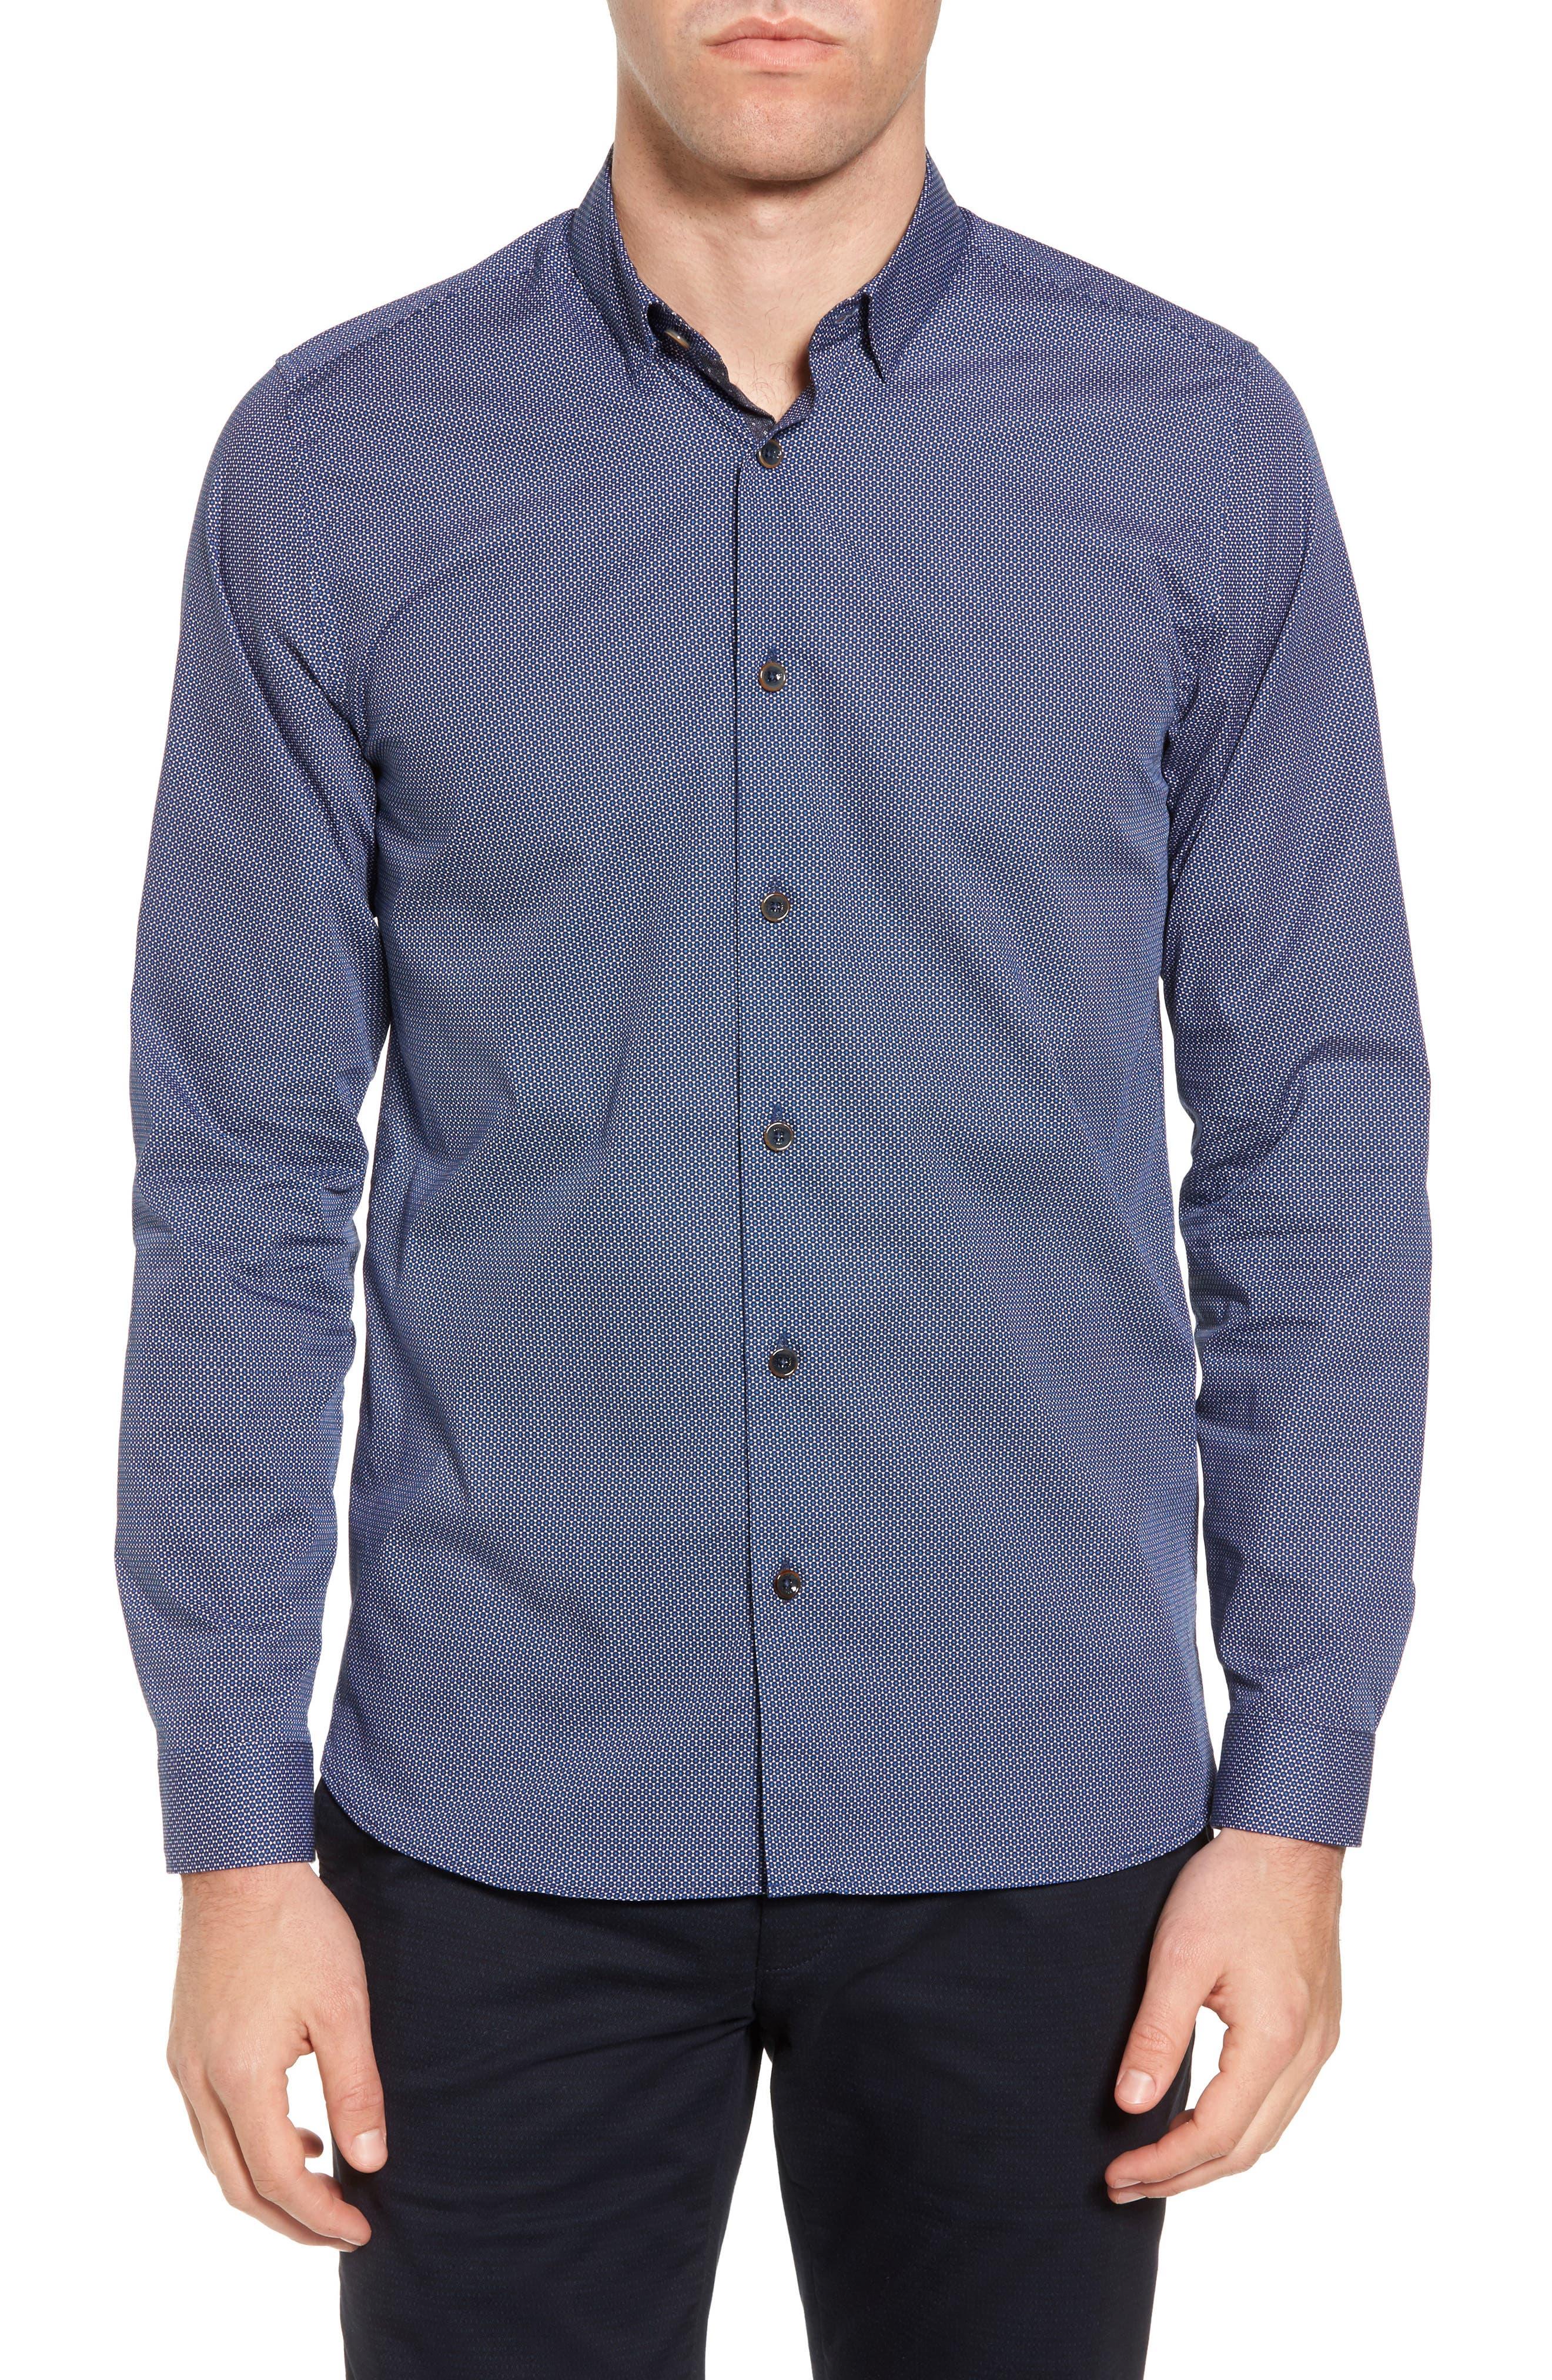 Merigeo Print Sport Shirt,                         Main,                         color, Navy